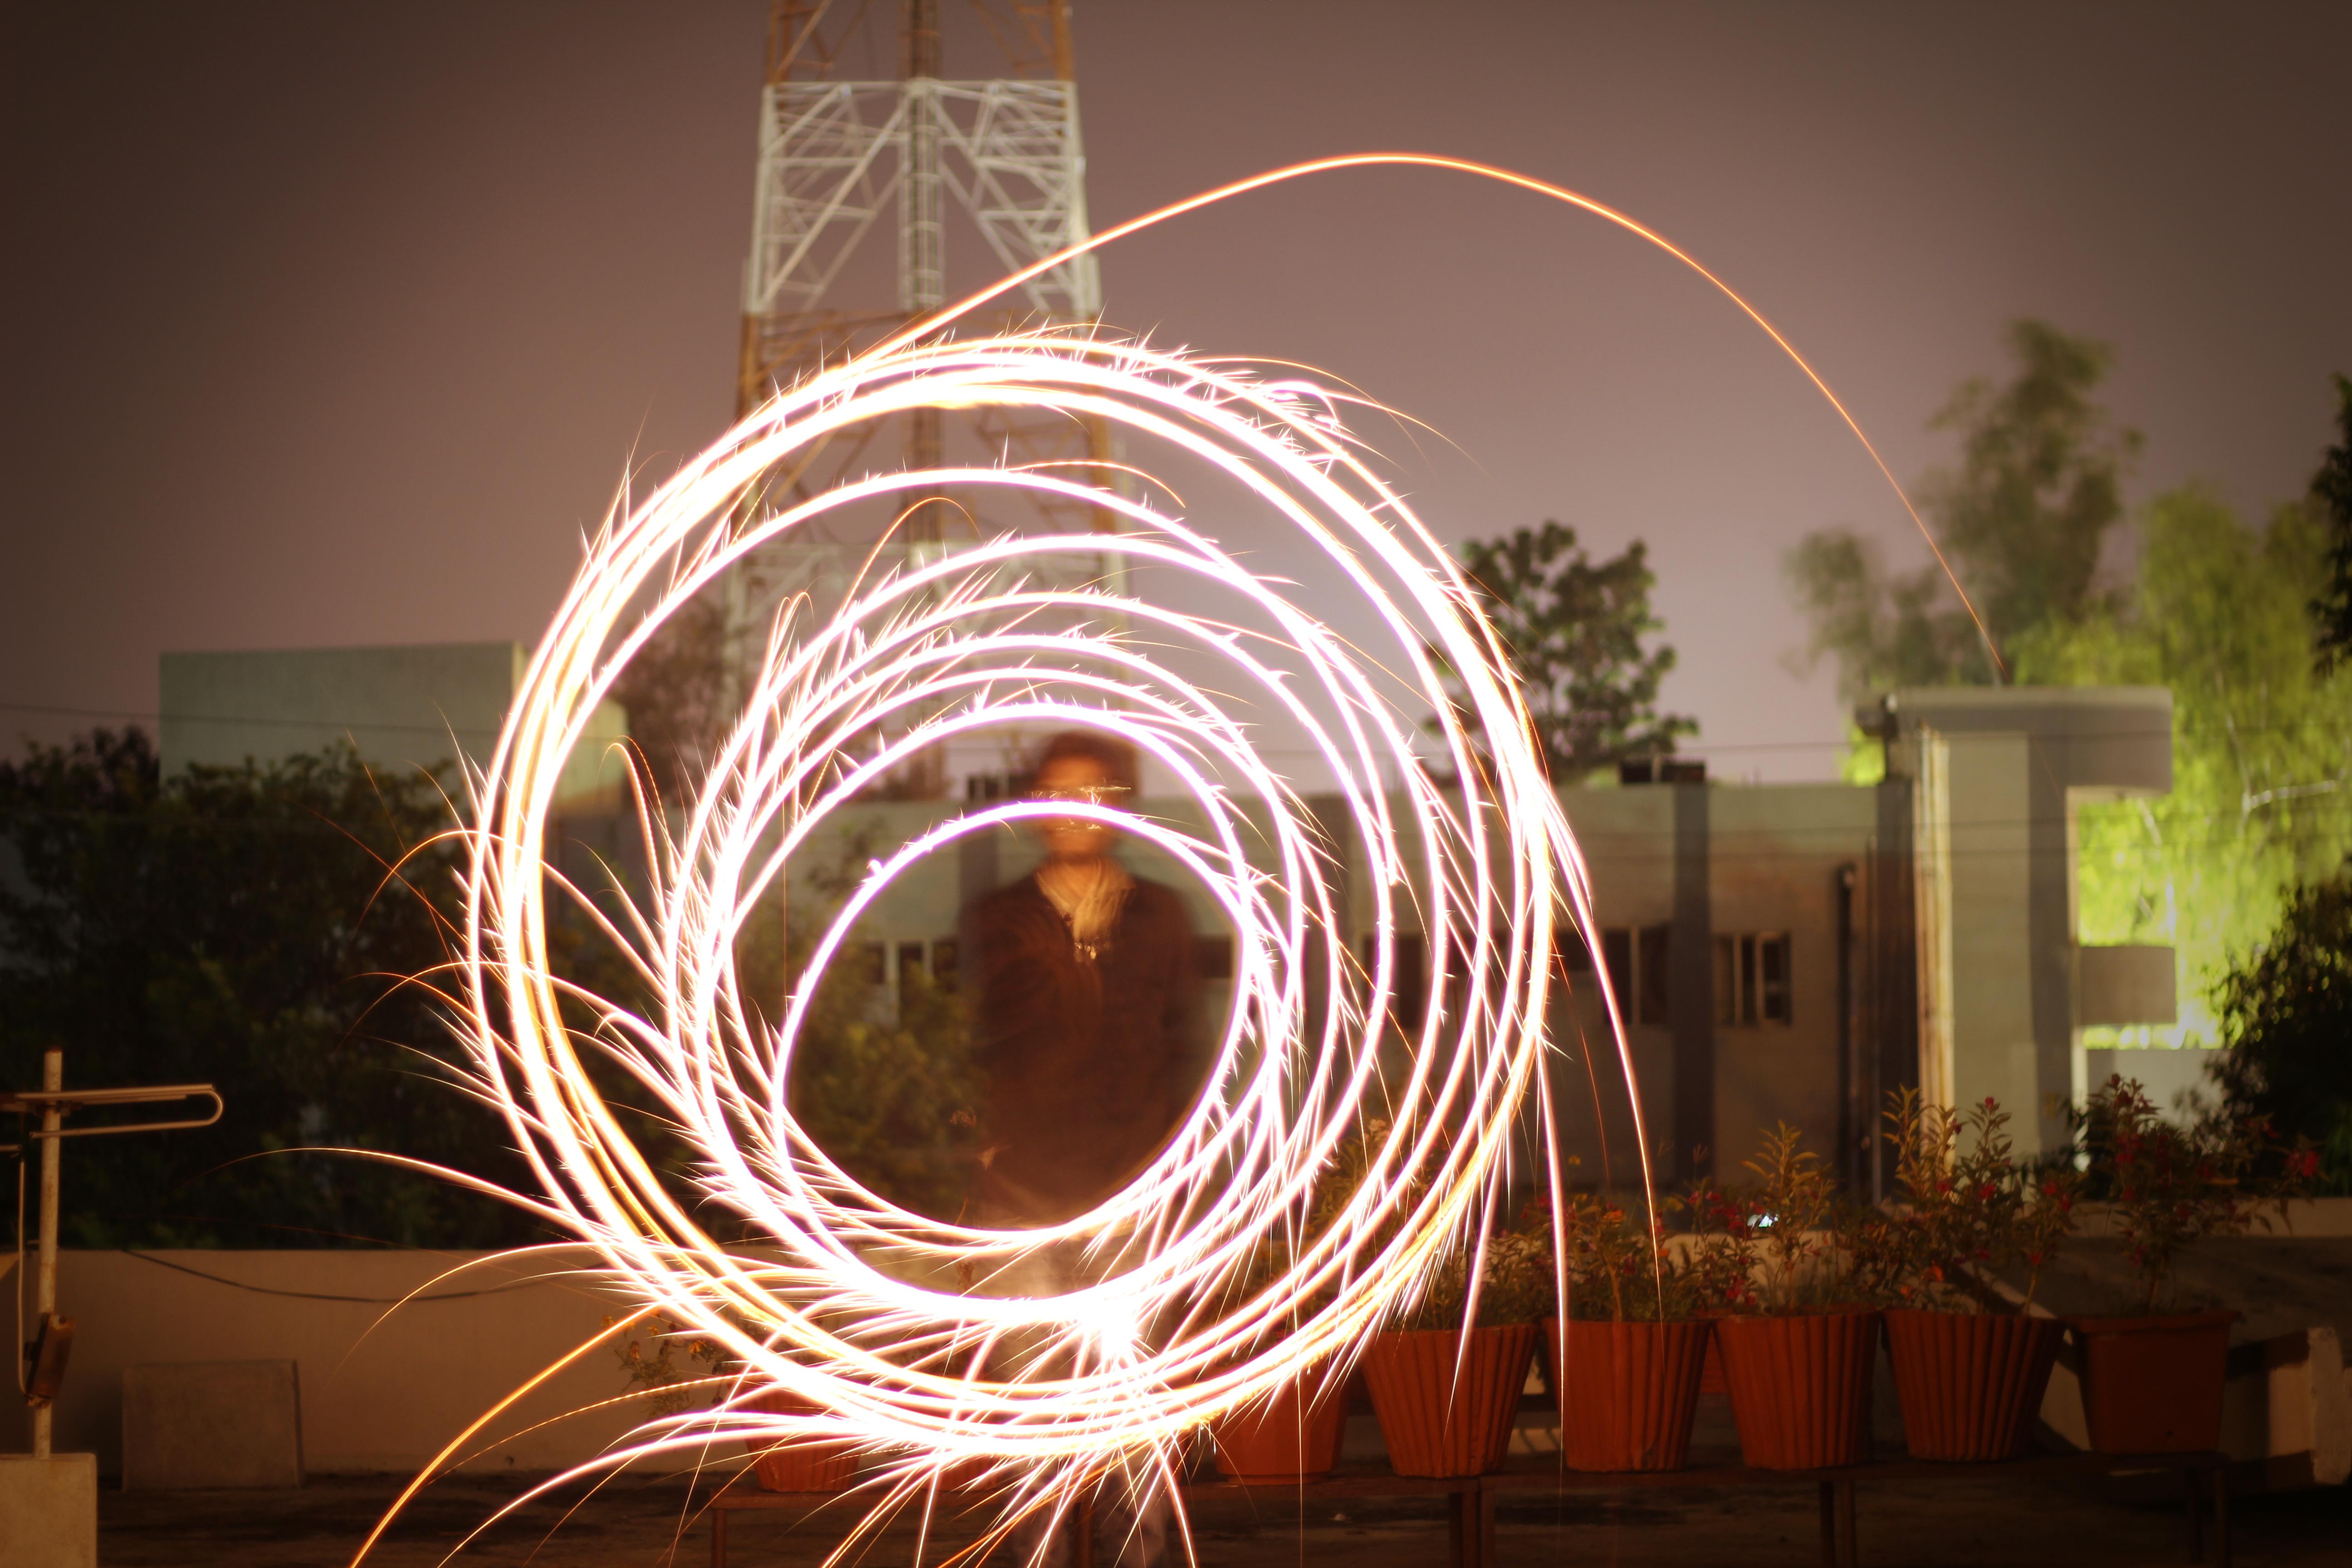 Light Painting-Diwali 2 by leostarkoneru on DeviantArt